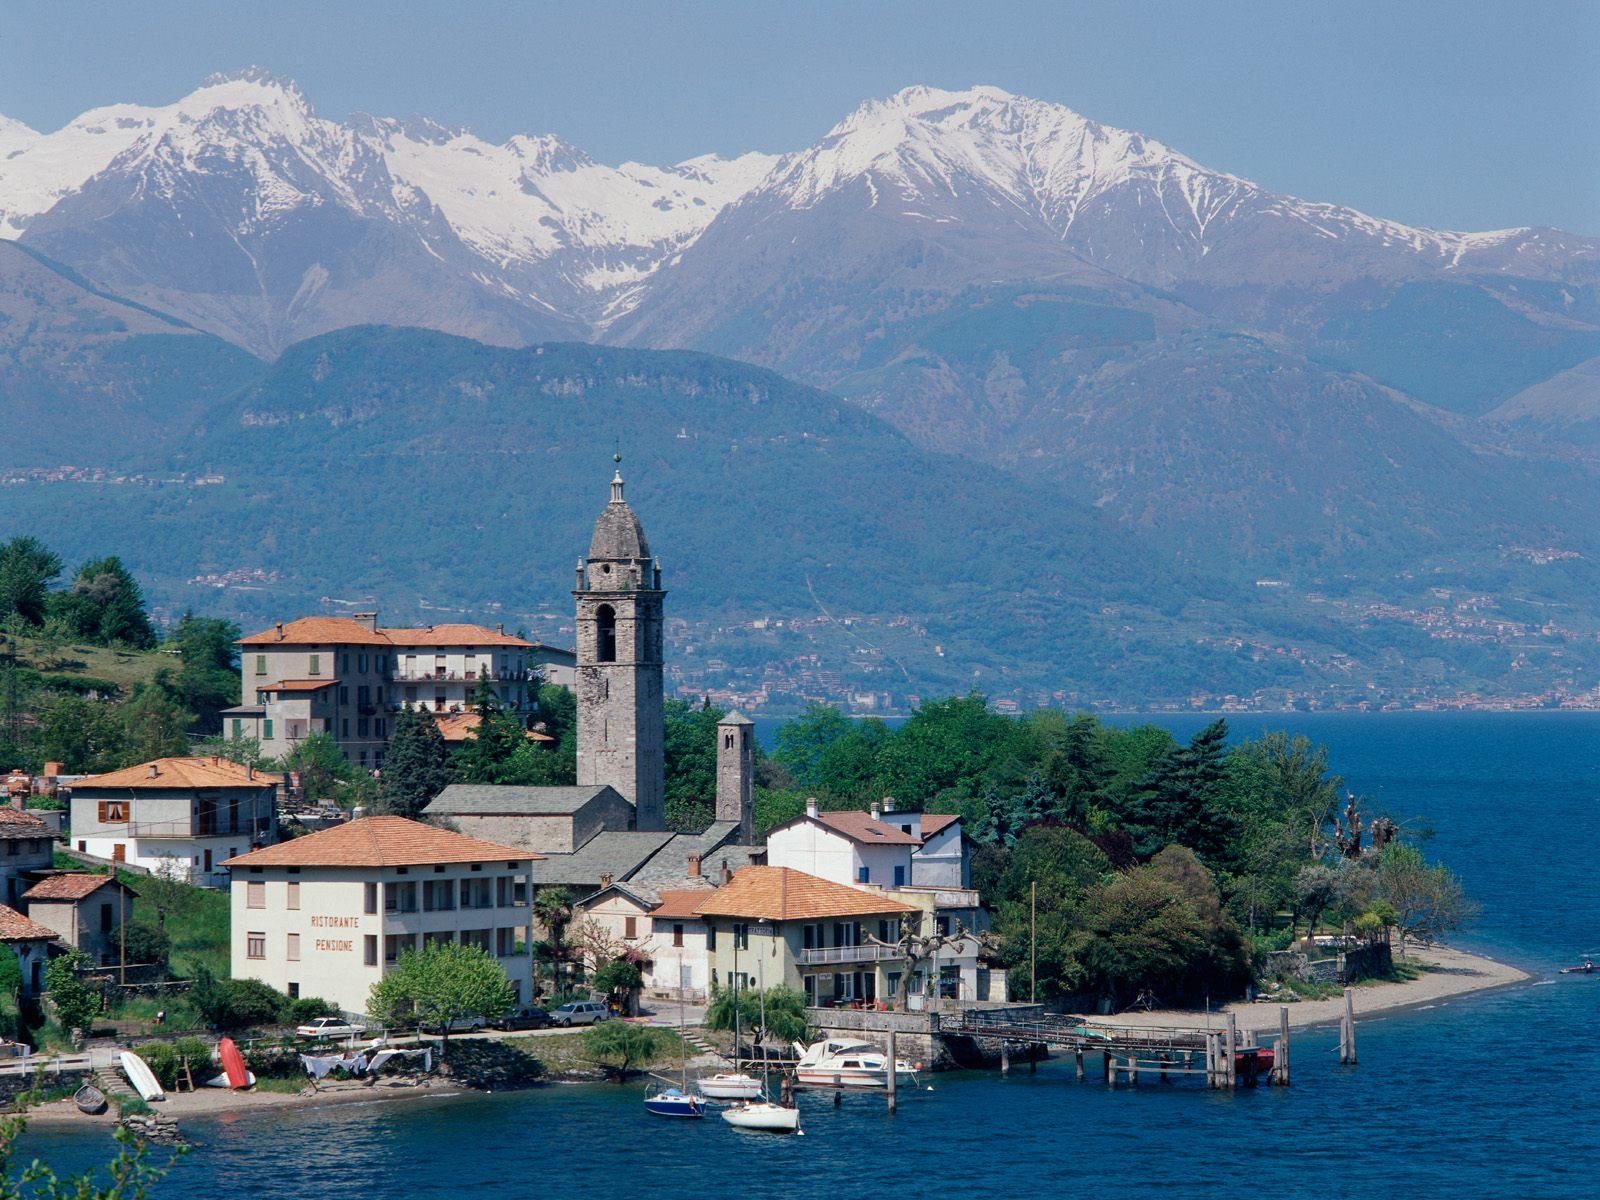 http://1.bp.blogspot.com/-a7YU2sidUXQ/Tcp30Hb6T1I/AAAAAAAACXI/eRNrjGHP5kU/s1600/Lake+Como%252C+Italy.jpg